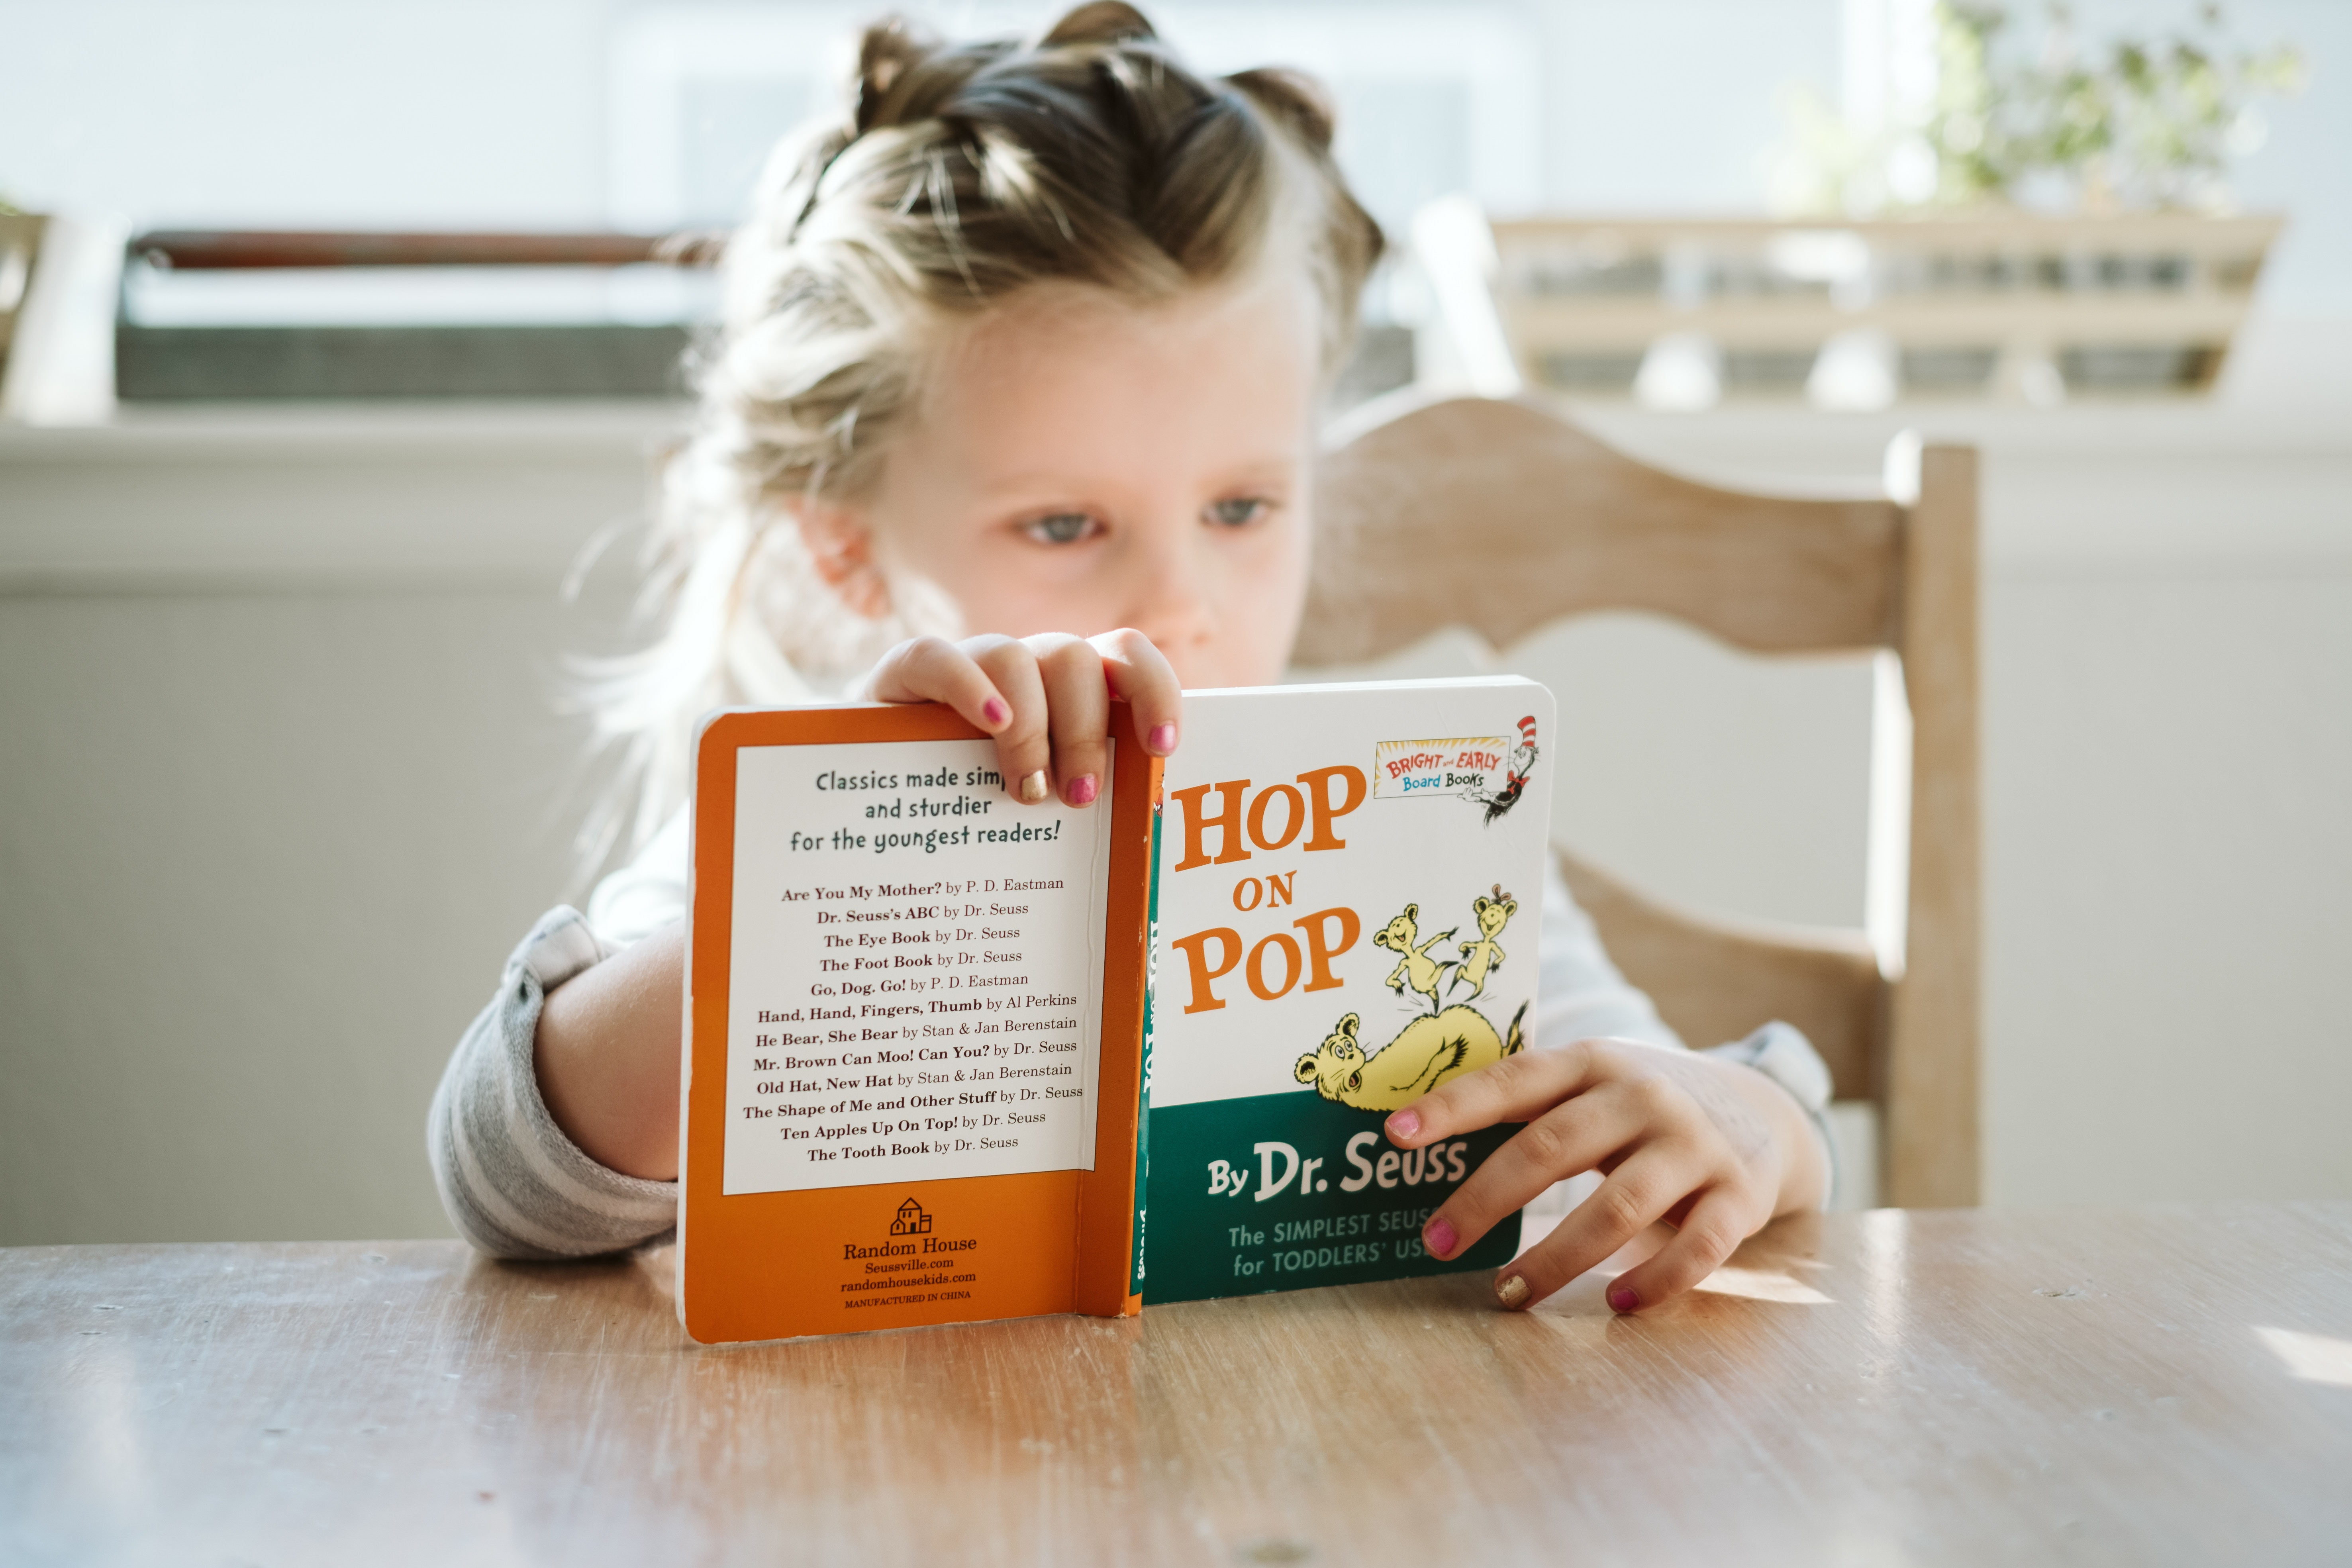 nz-ece-child-reading-book